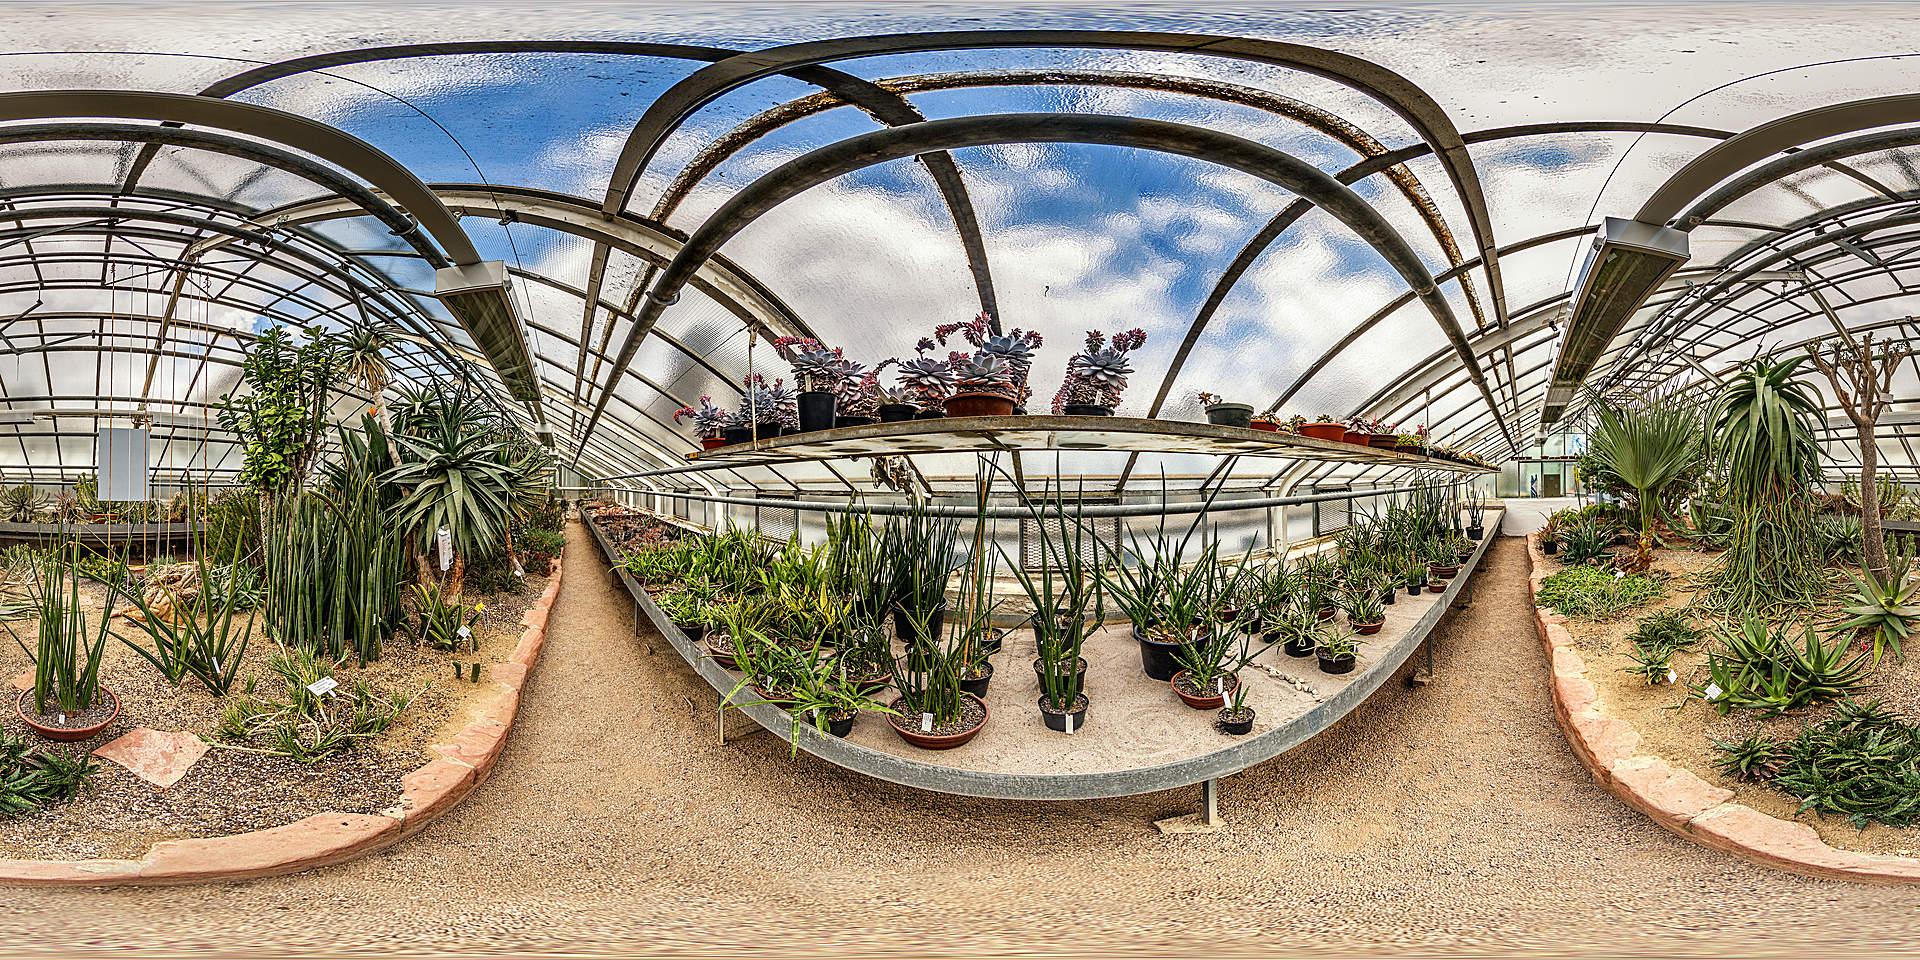 Botanischer Garten Heidelberg - Sukkulenten